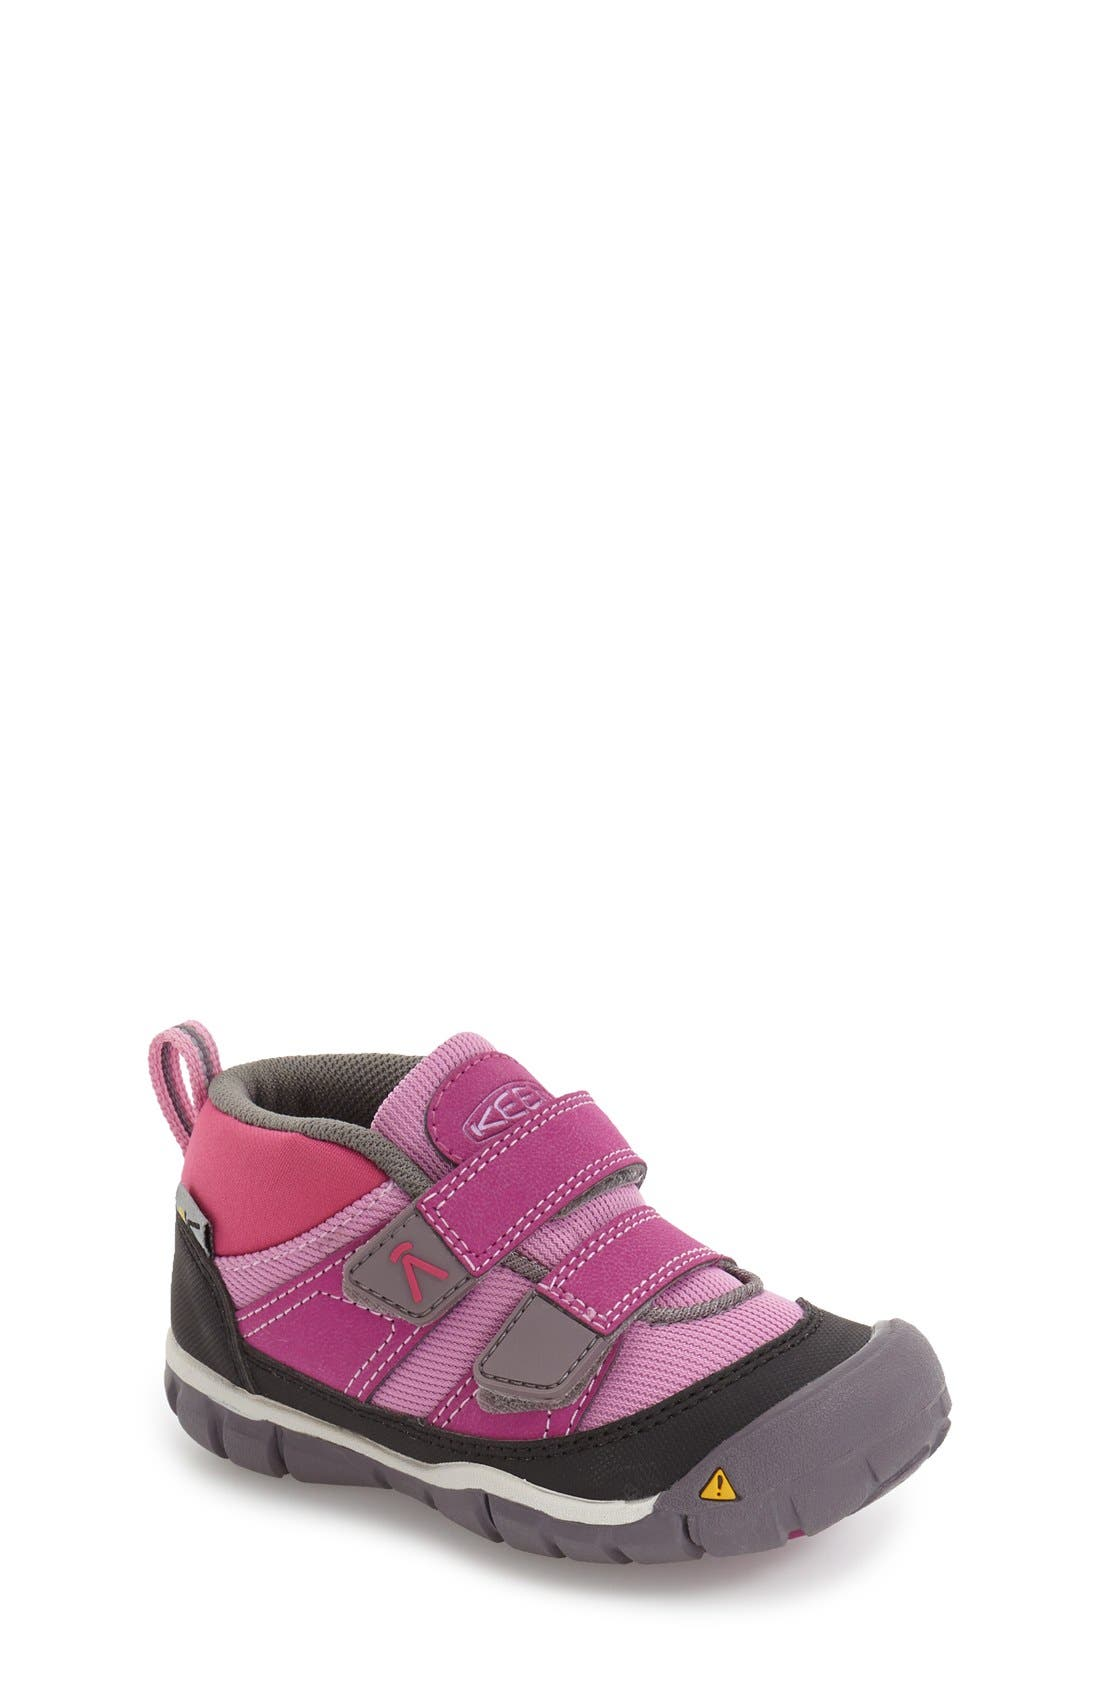 Alternate Image 1 Selected - Keen Peek-a-Shoe Sneaker (Walker & Toddler)